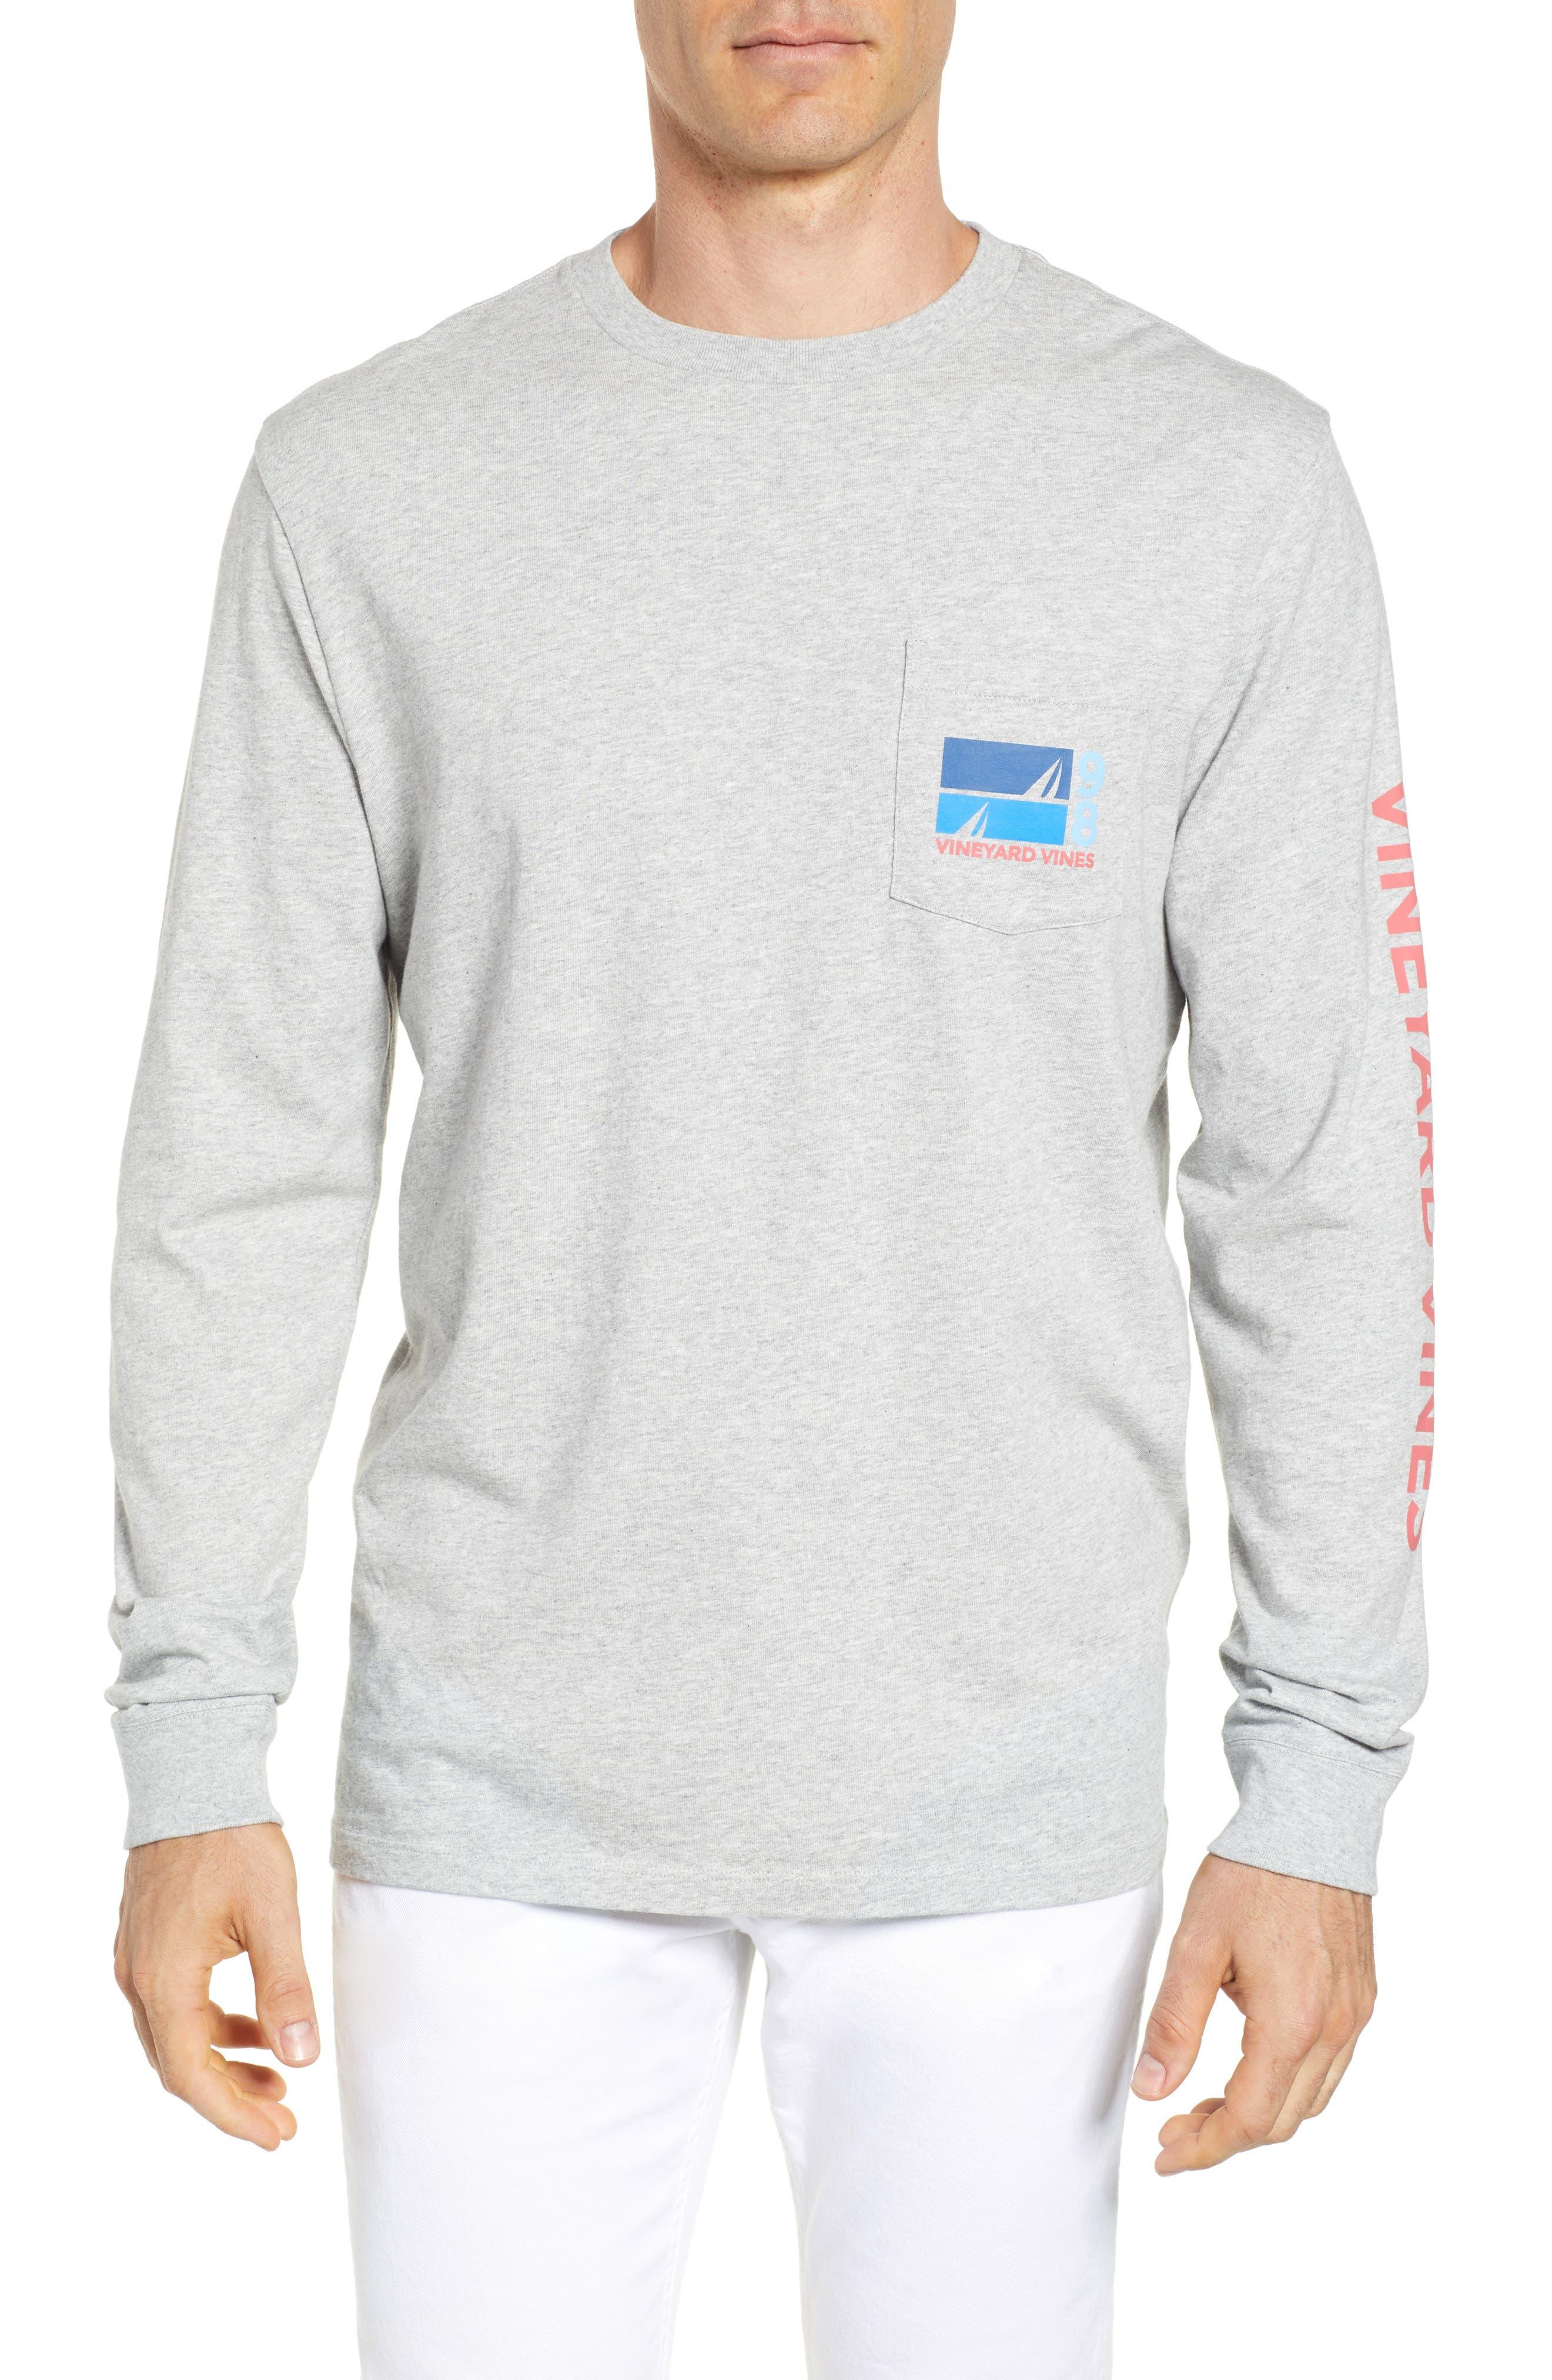 VINEYARD VINES,                             Sailing Blue Regular Fit Crewneck T-Shirt,                             Main thumbnail 1, color,                             039